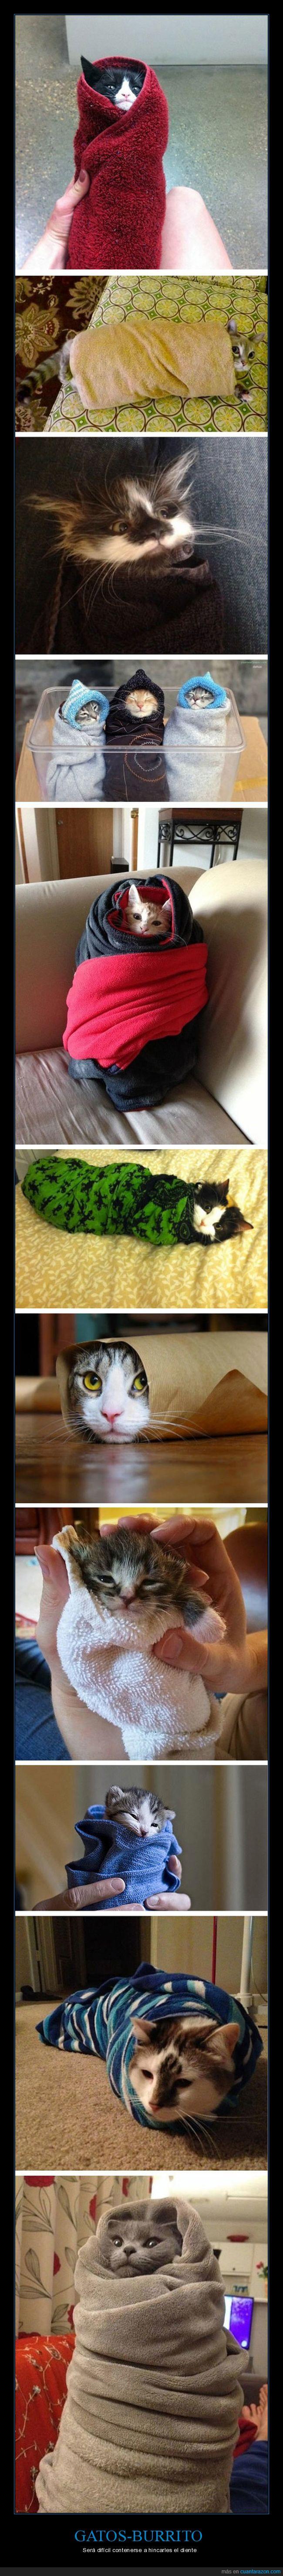 burrito,gato,manta,recogiditos